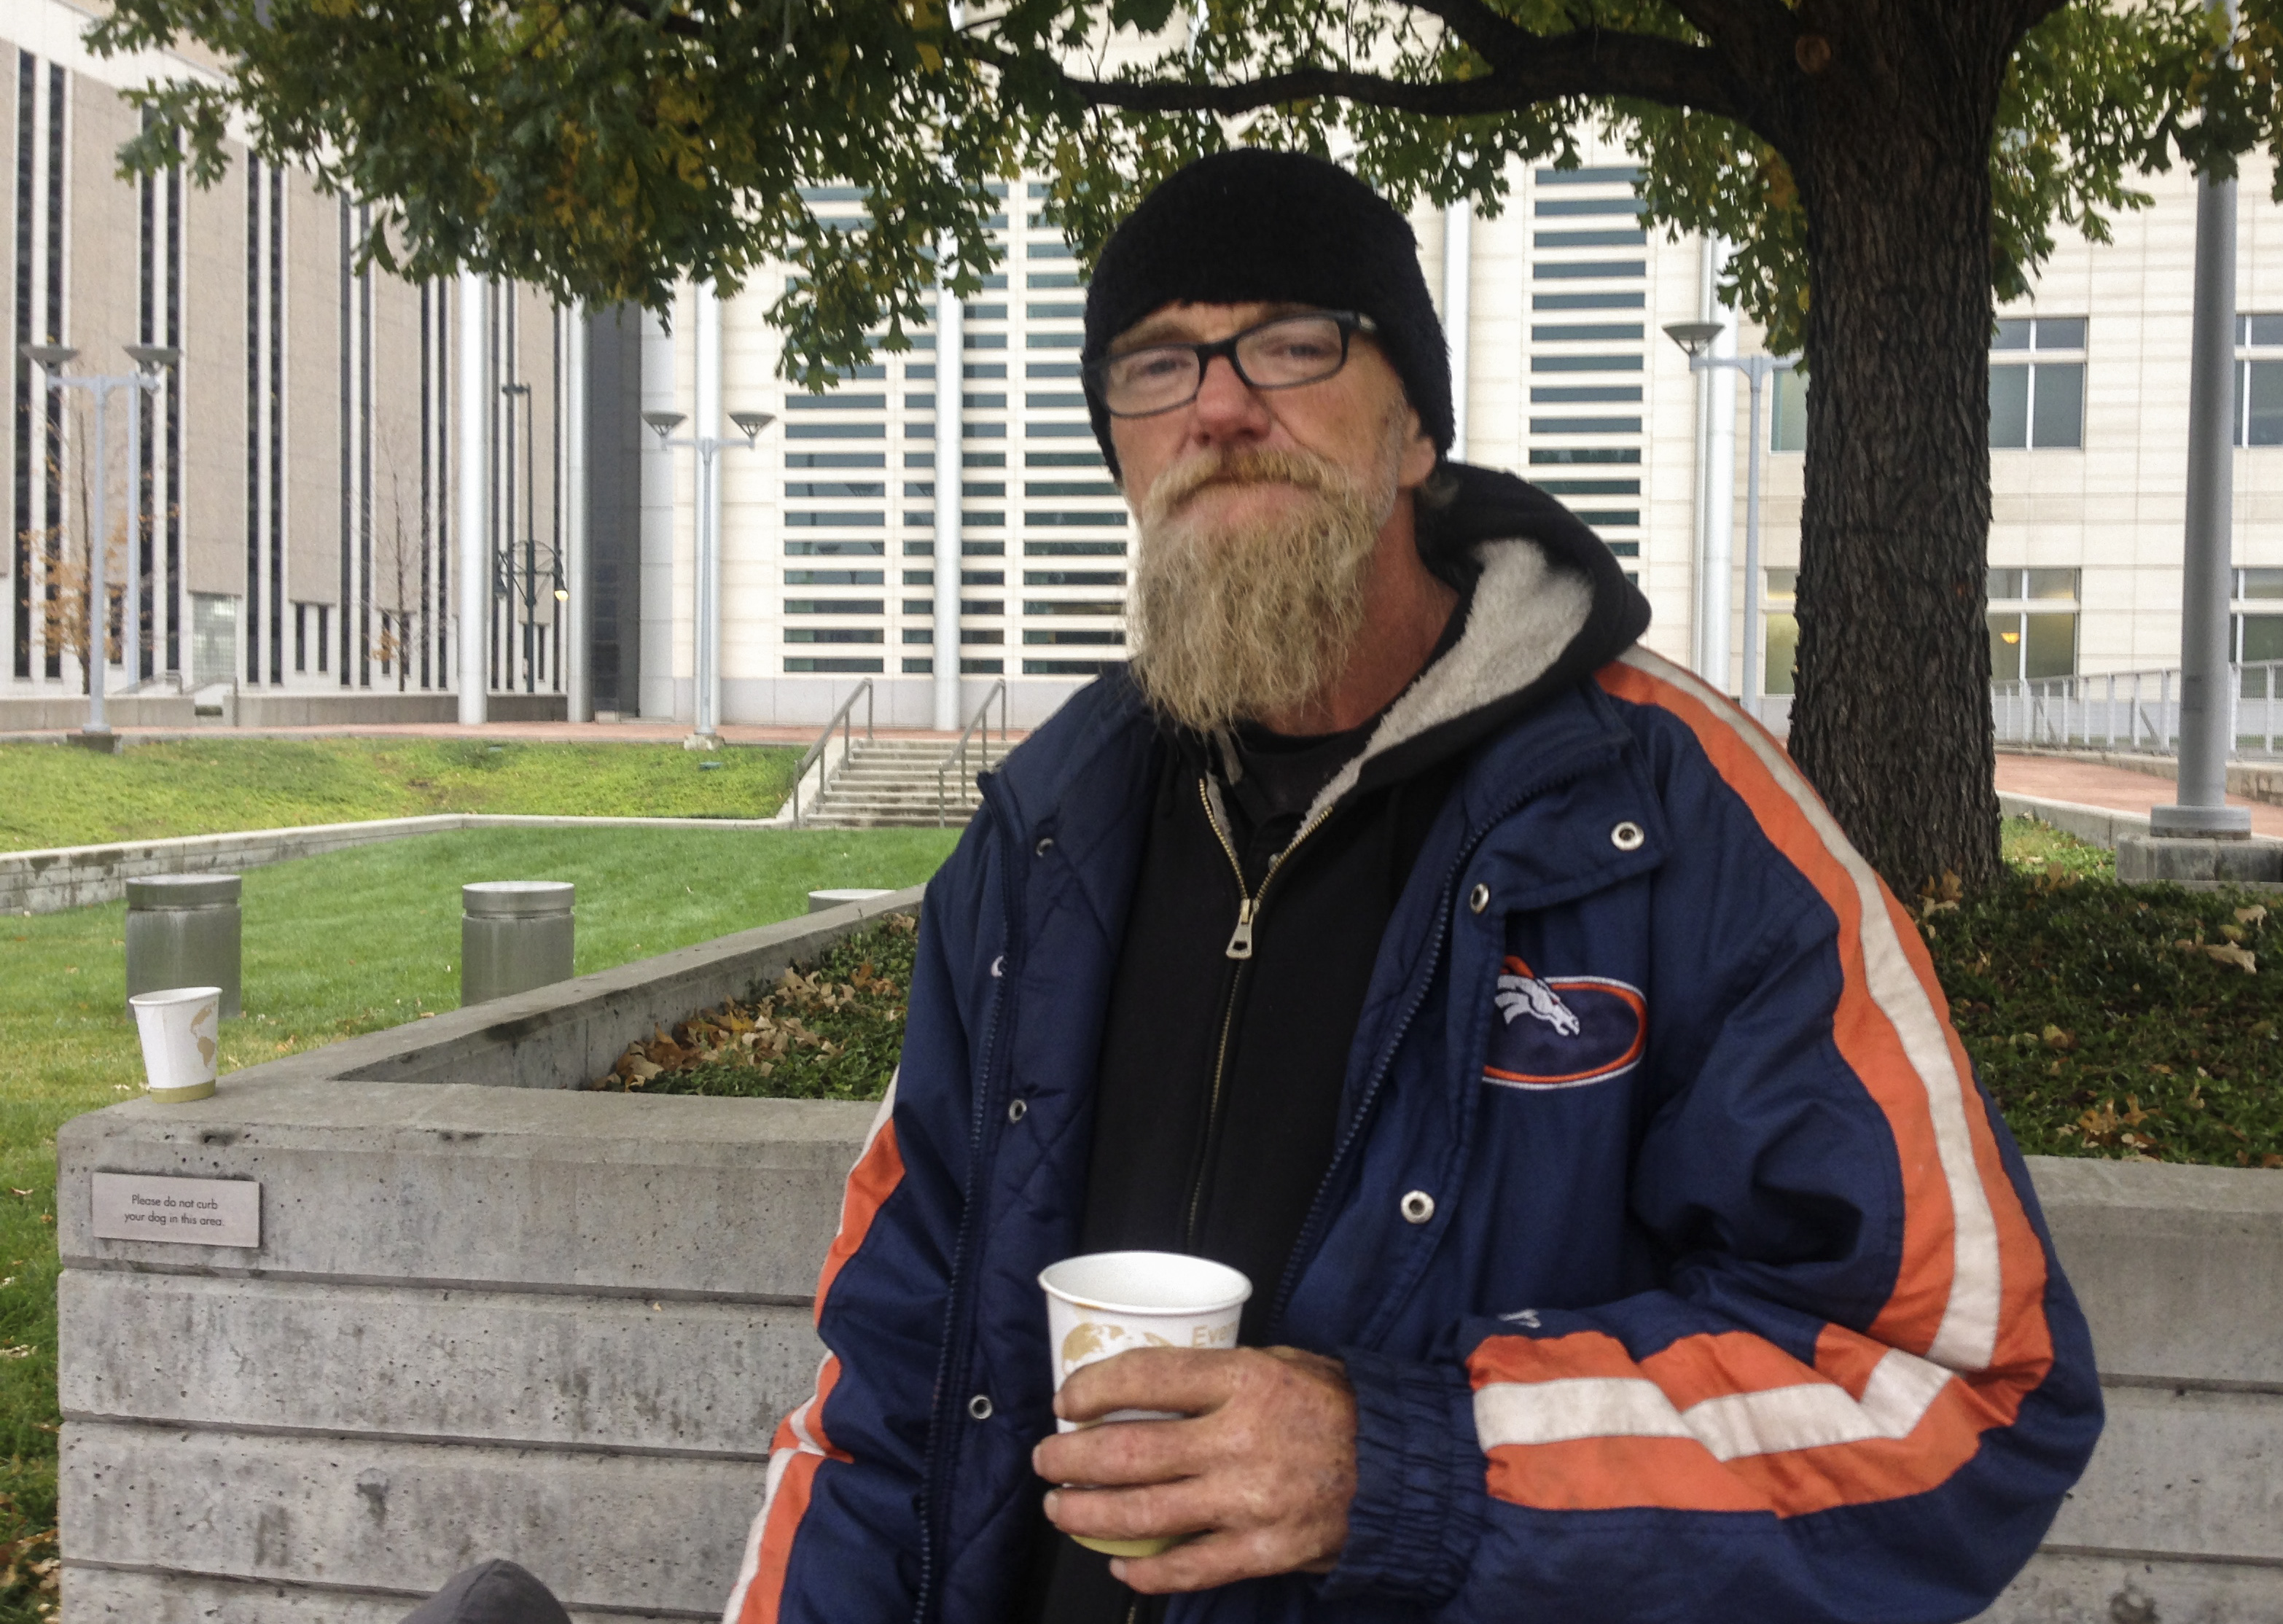 Photo: Garry Anderson, homeless plaintiff